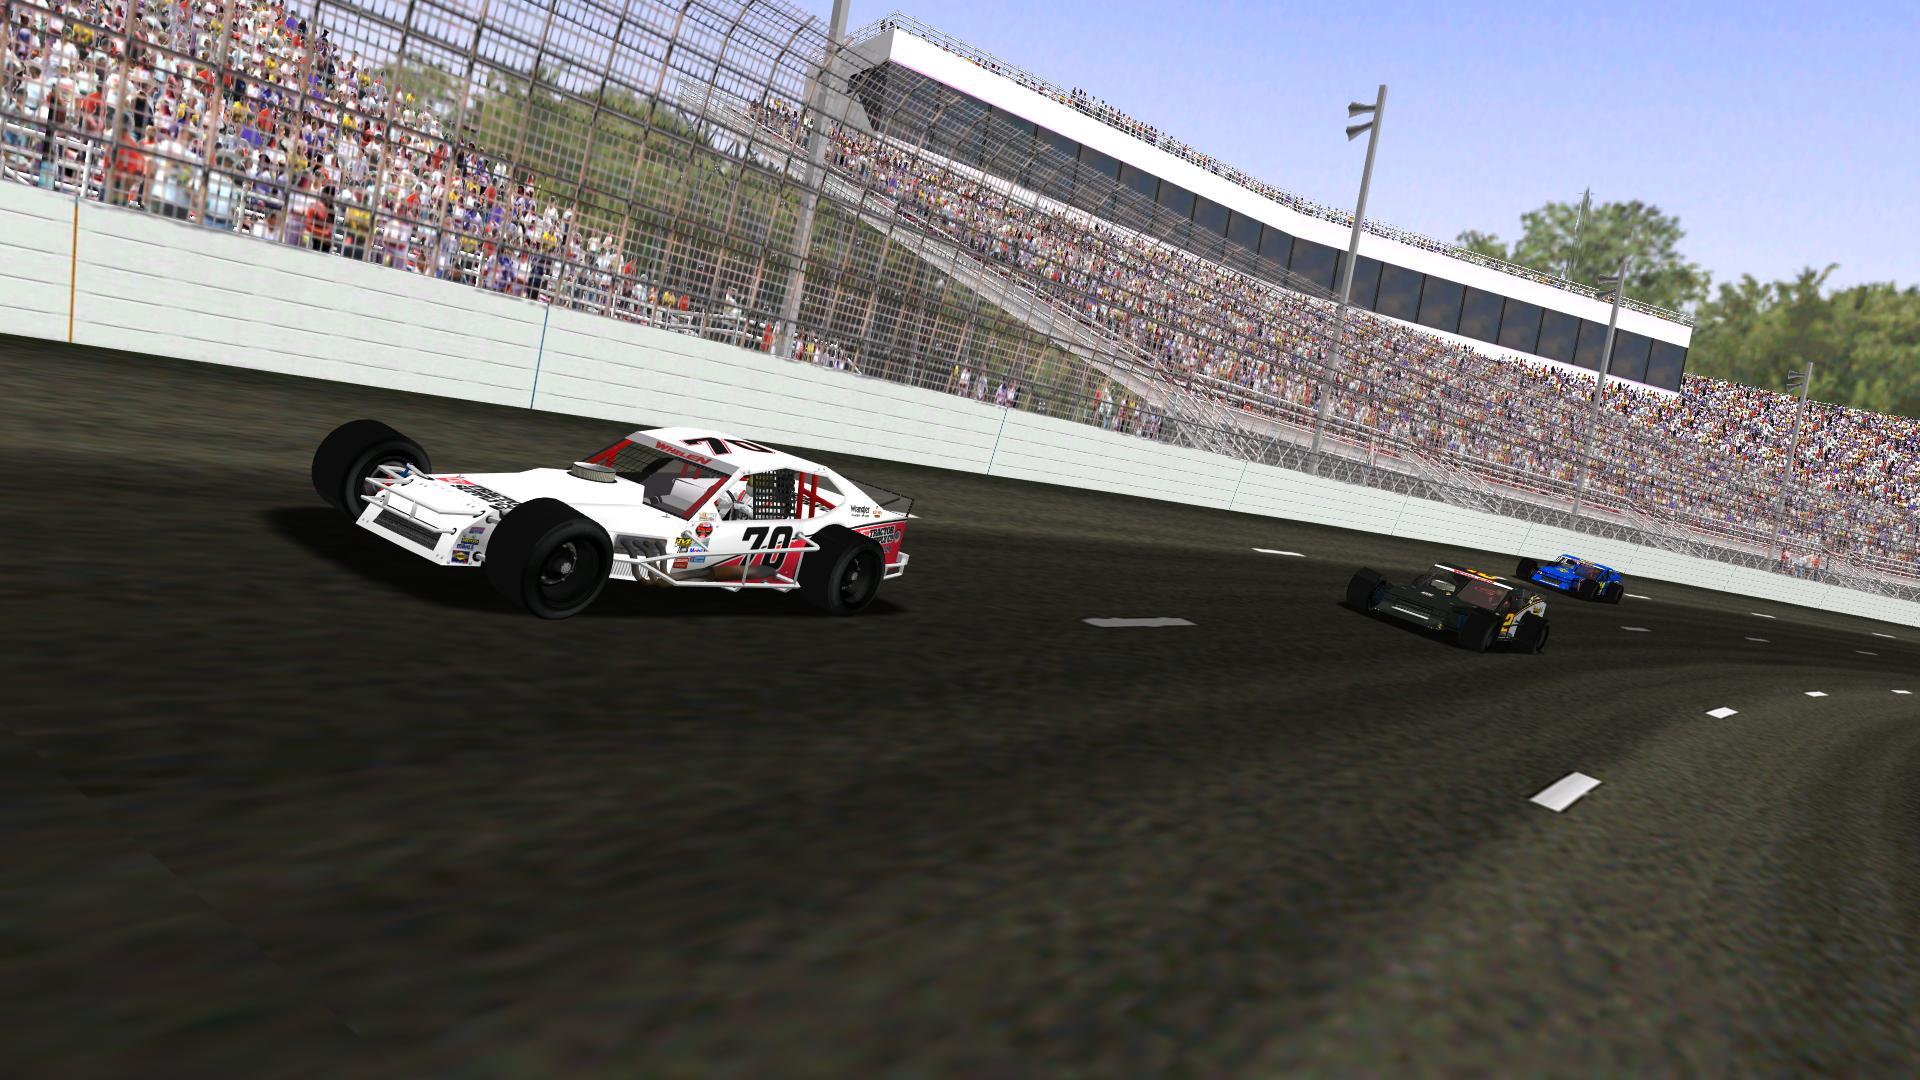 lepage71 leads Speedyman11 and Rookiesrock through turns 3 & 4. (NHMA)